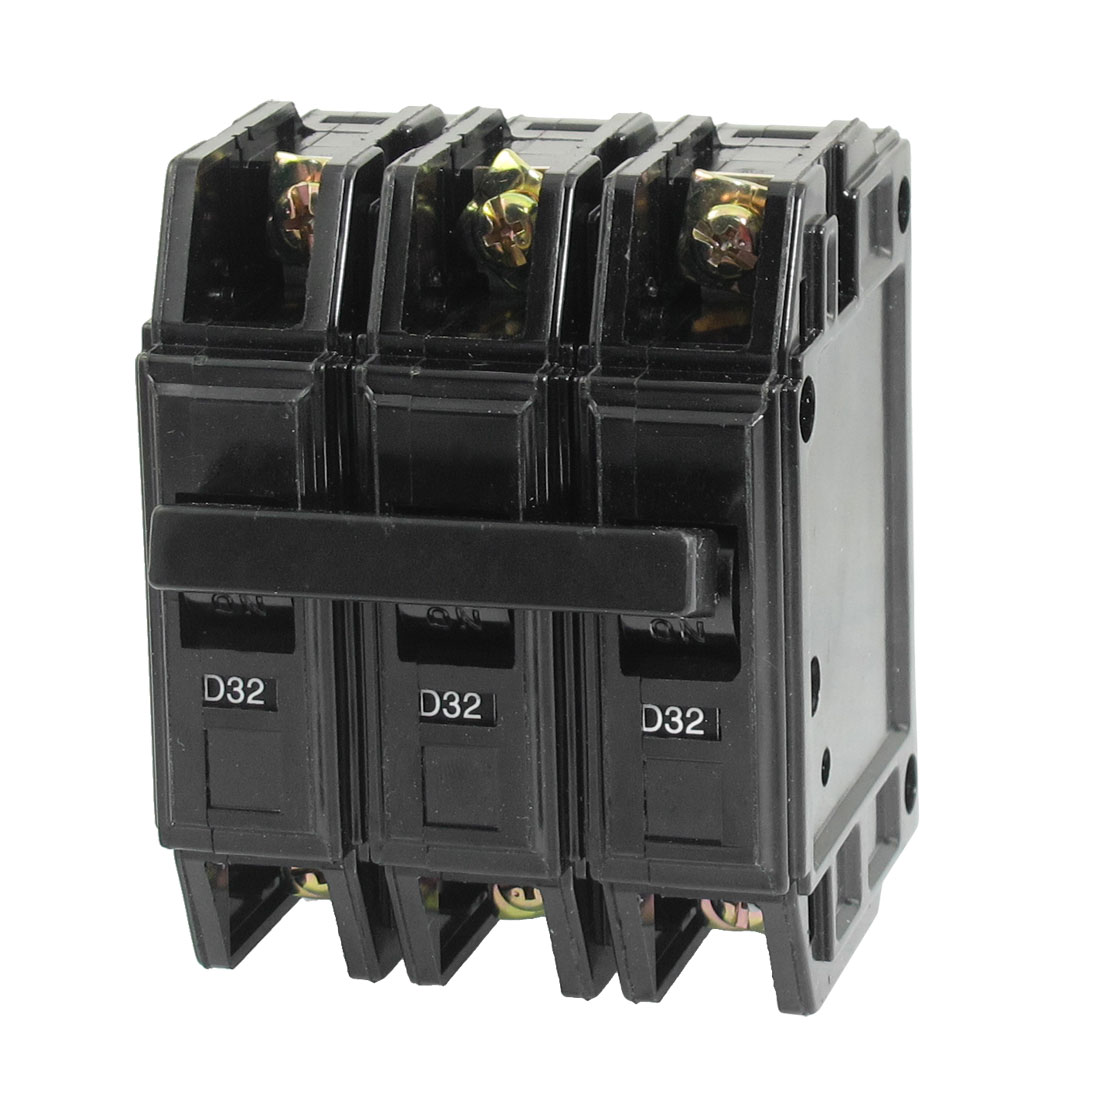 AC 220V 380V 32A 3P 3 Pole Moulded Case Circuit Breaker DZ12-63 D32